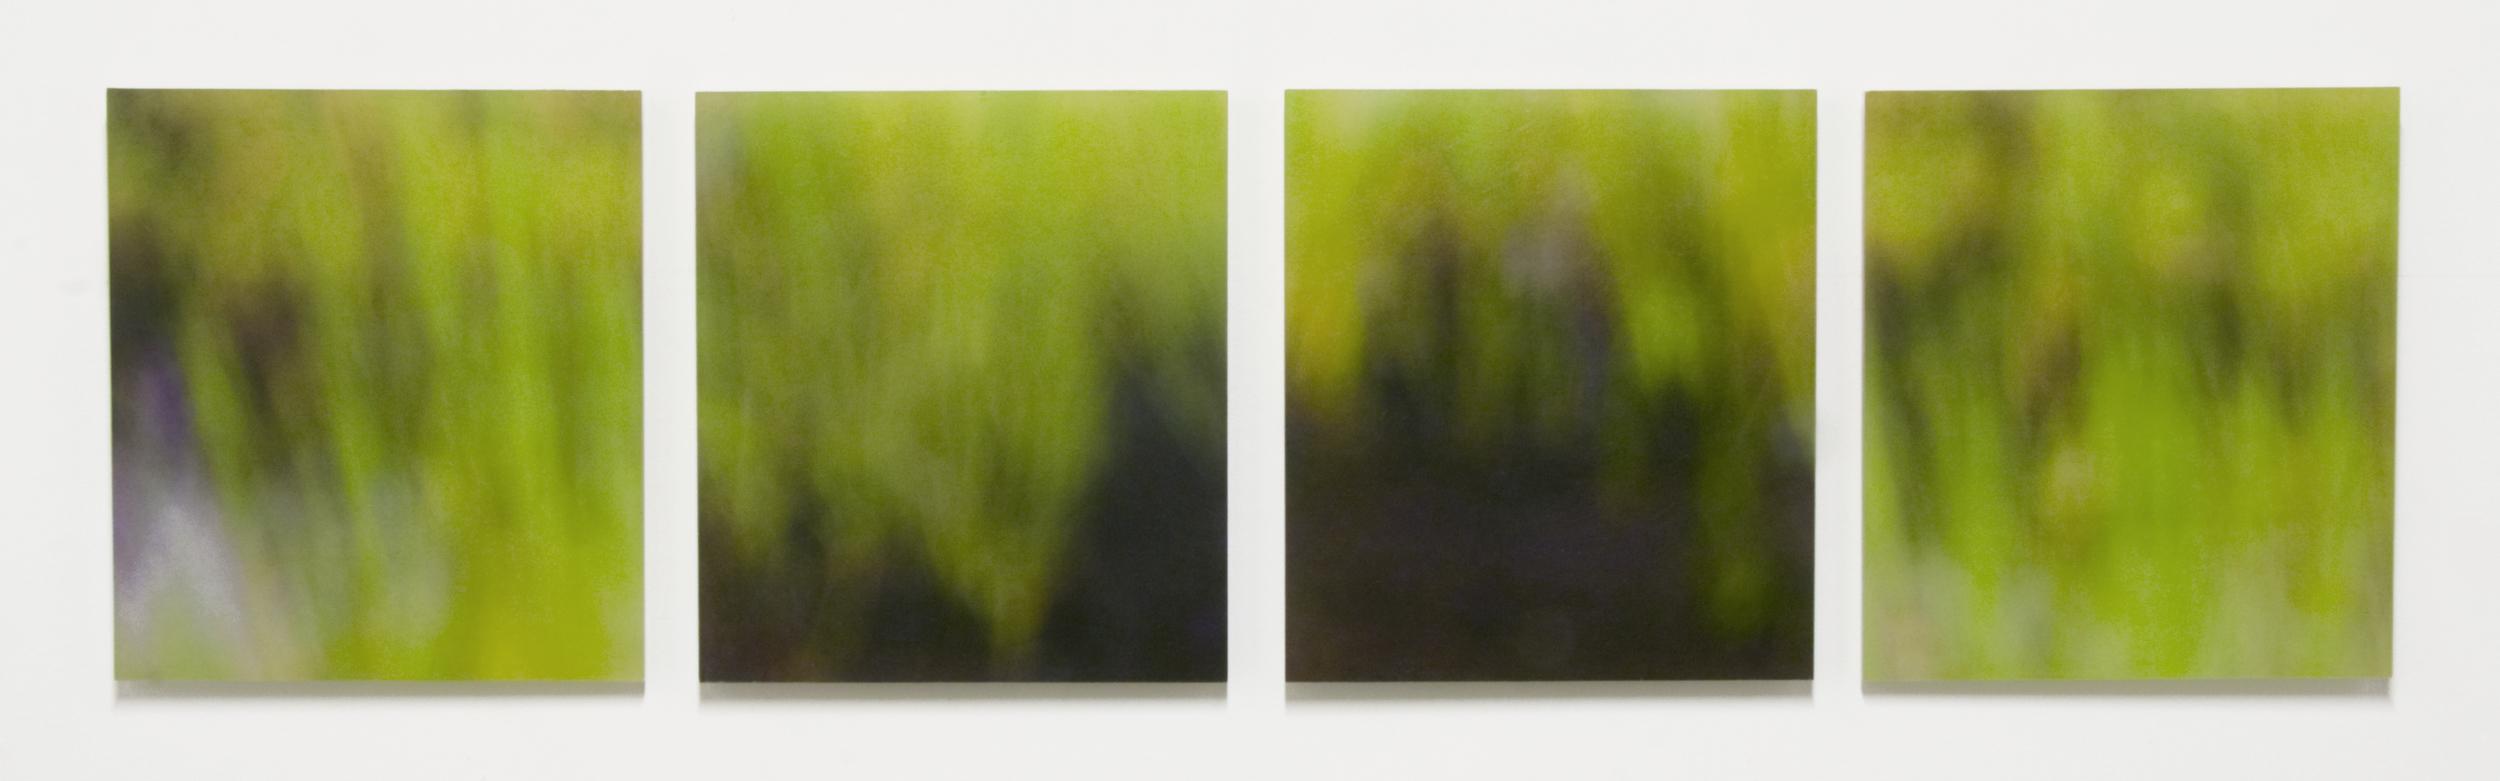 Marsh Grass, No.3